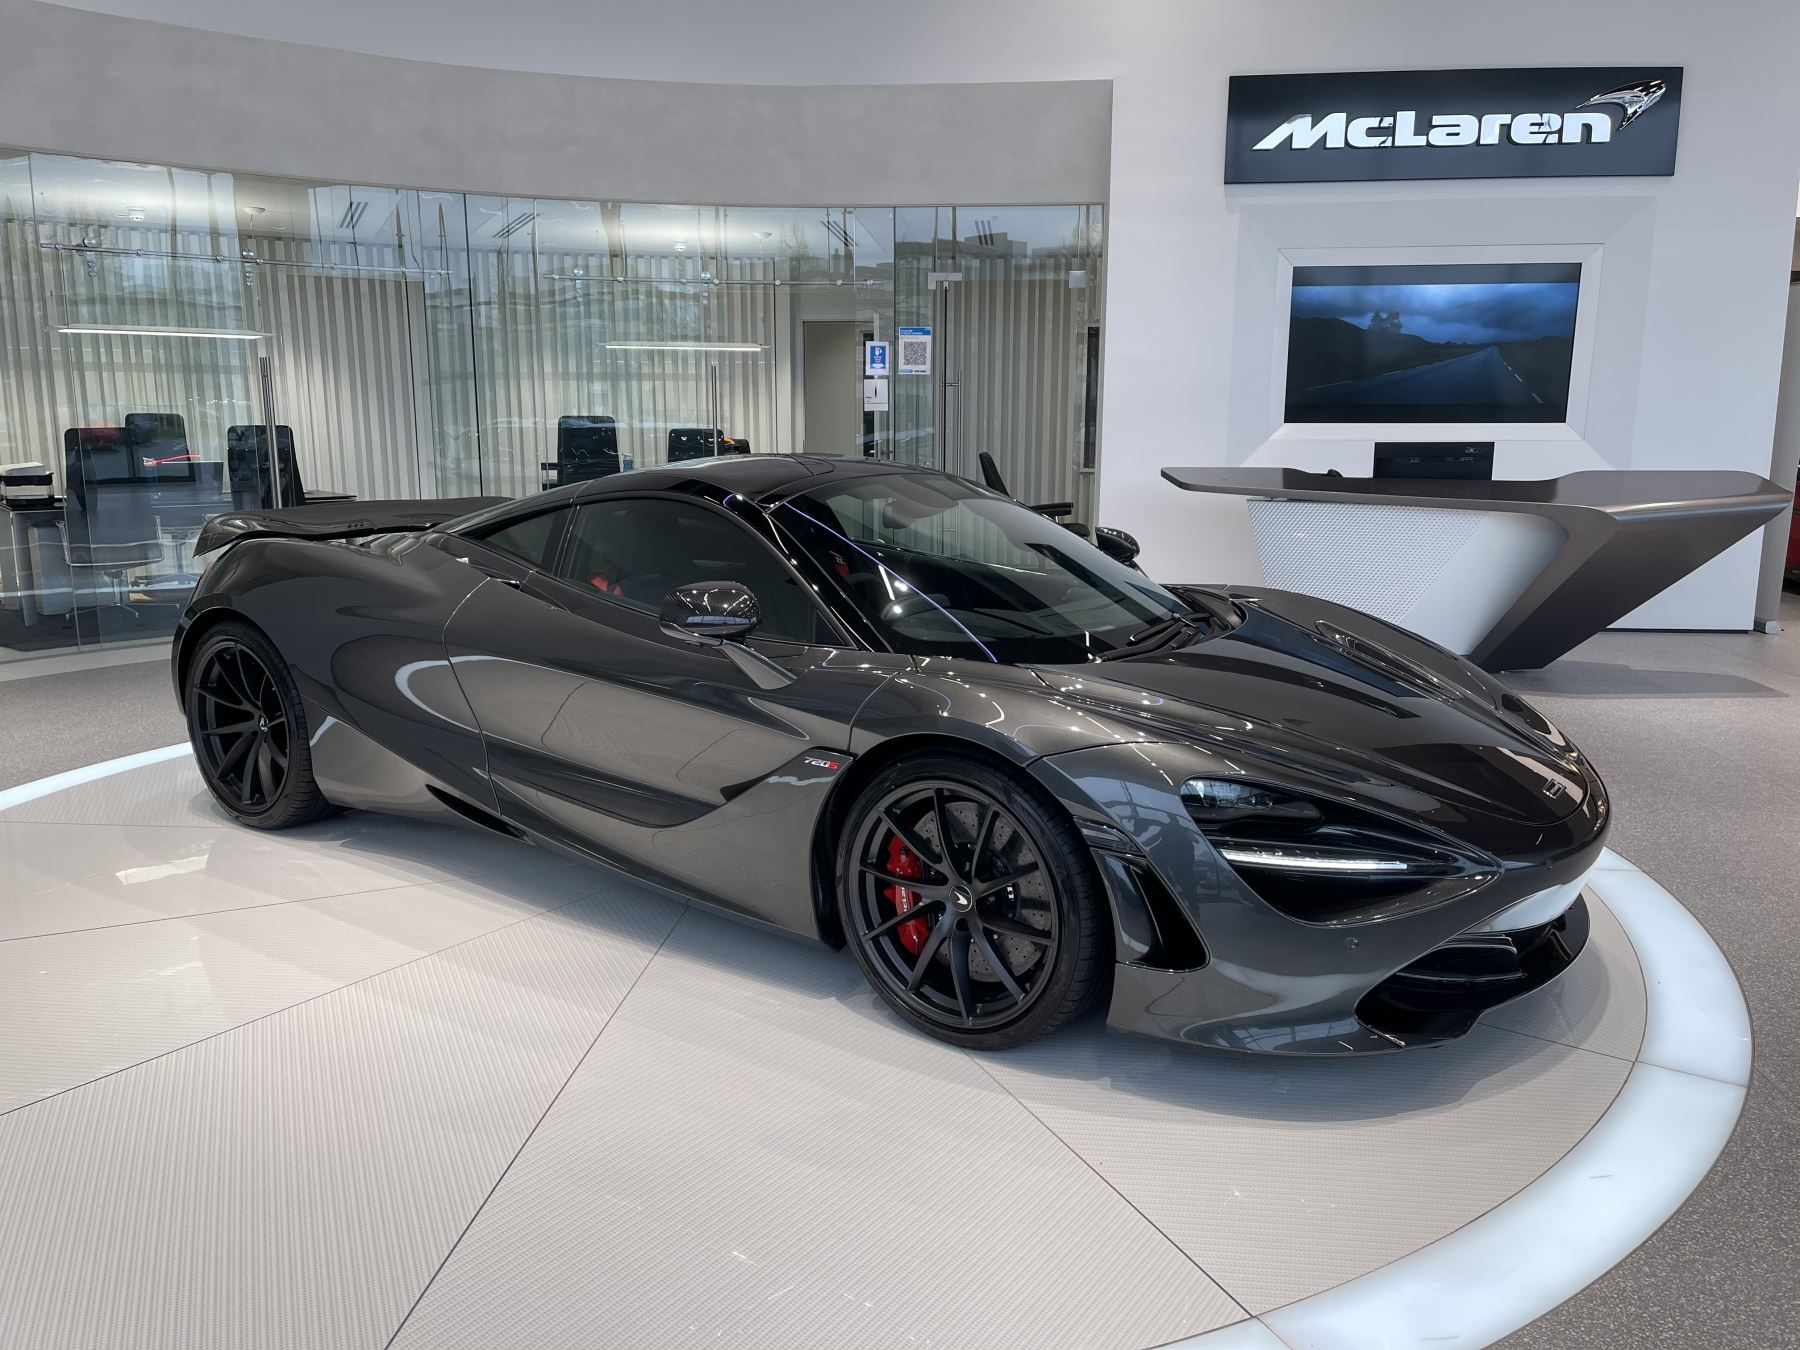 McLaren 720S 4.V8 2 DR PERFORMANCE 4.0 Automatic 2 door Coupe (2020)